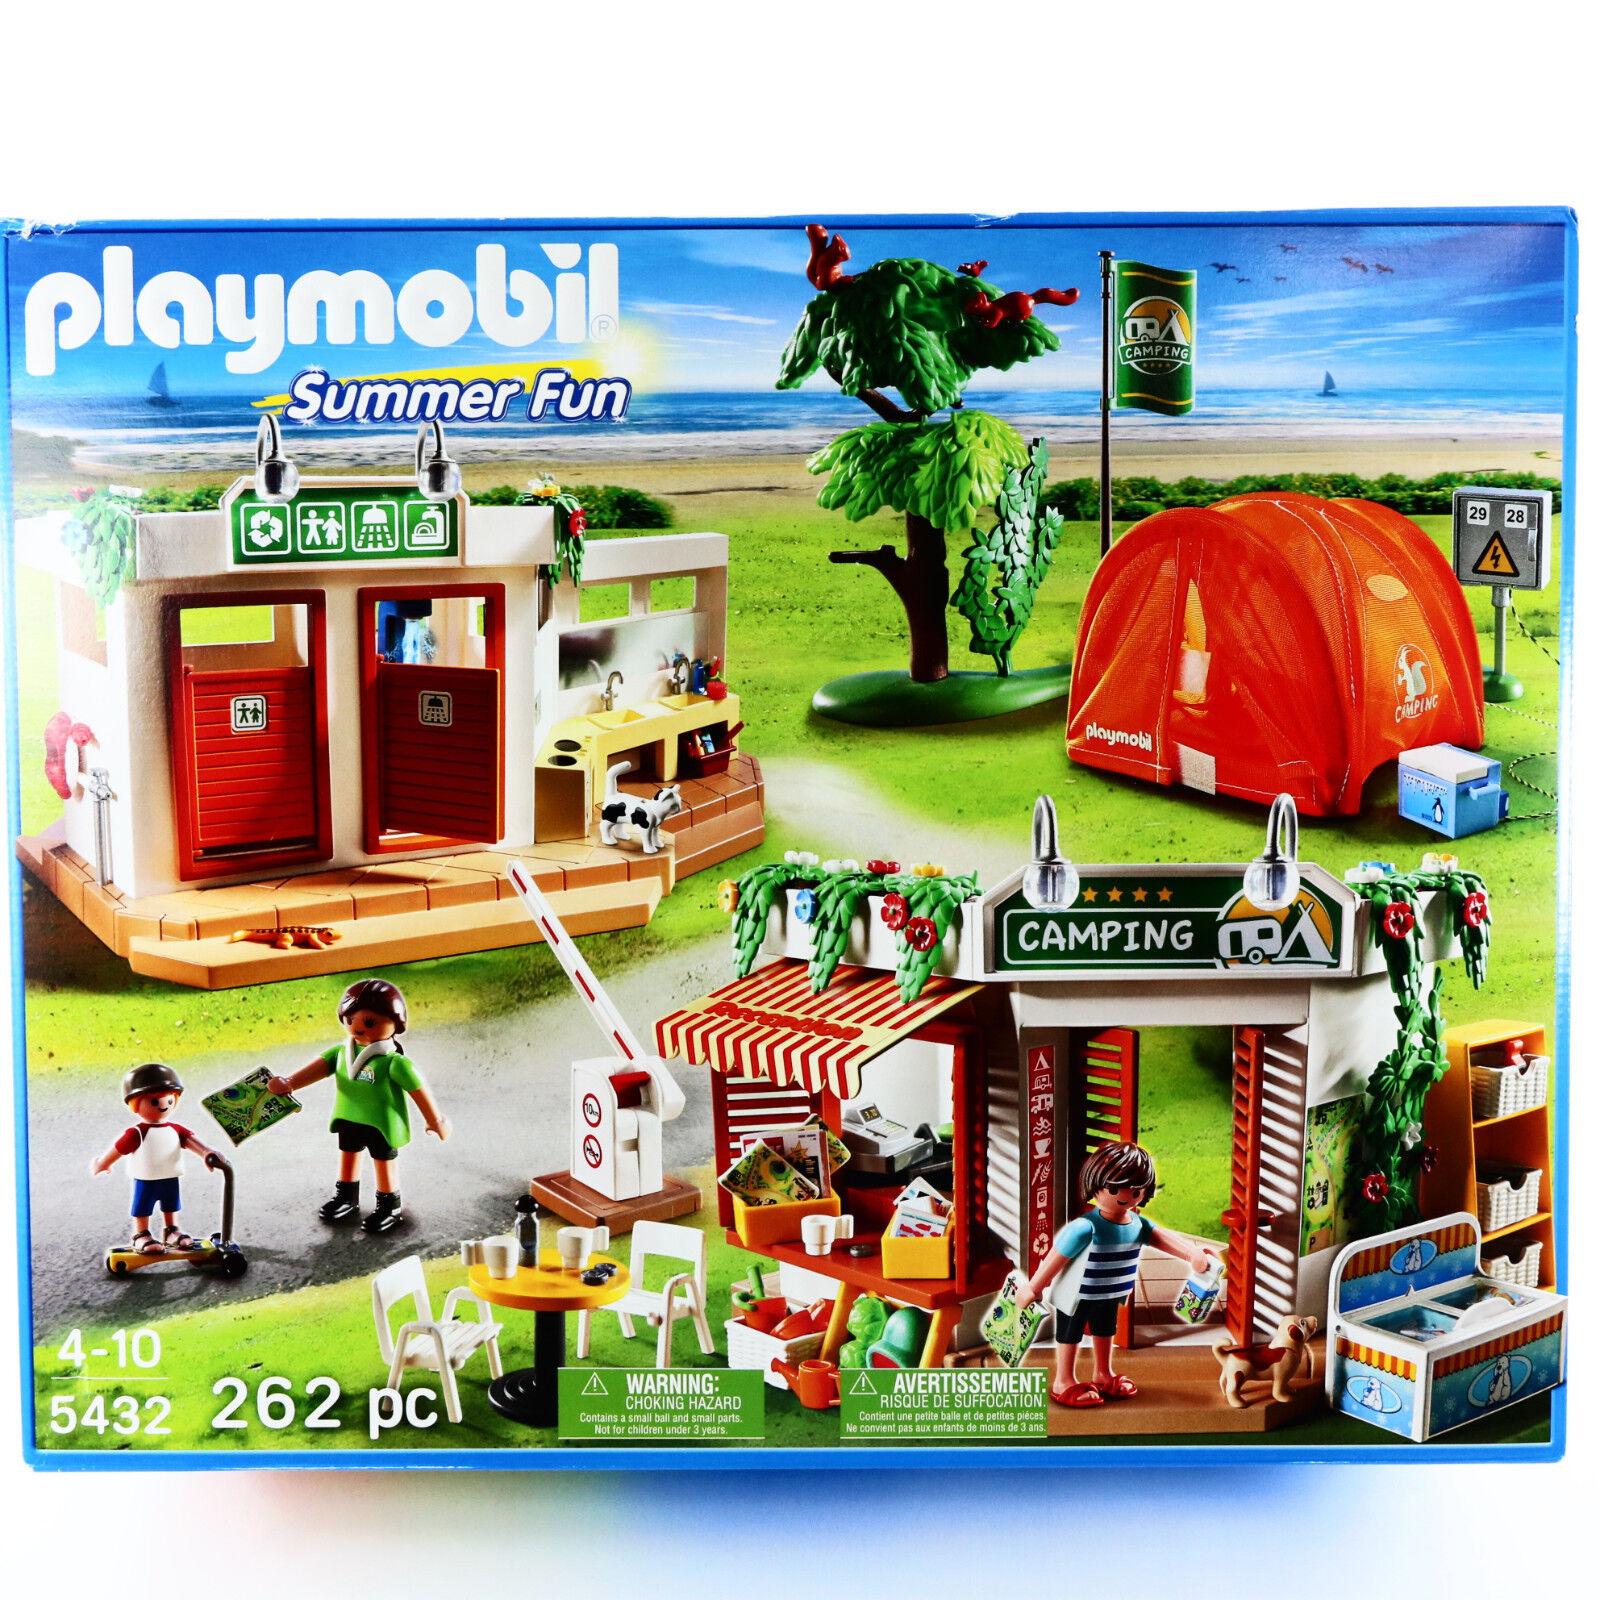 Spela bilen Camp Site Summer Fun 5432 Enorm spelagset Camping Leksaker Ålder 4 5 6 7 8